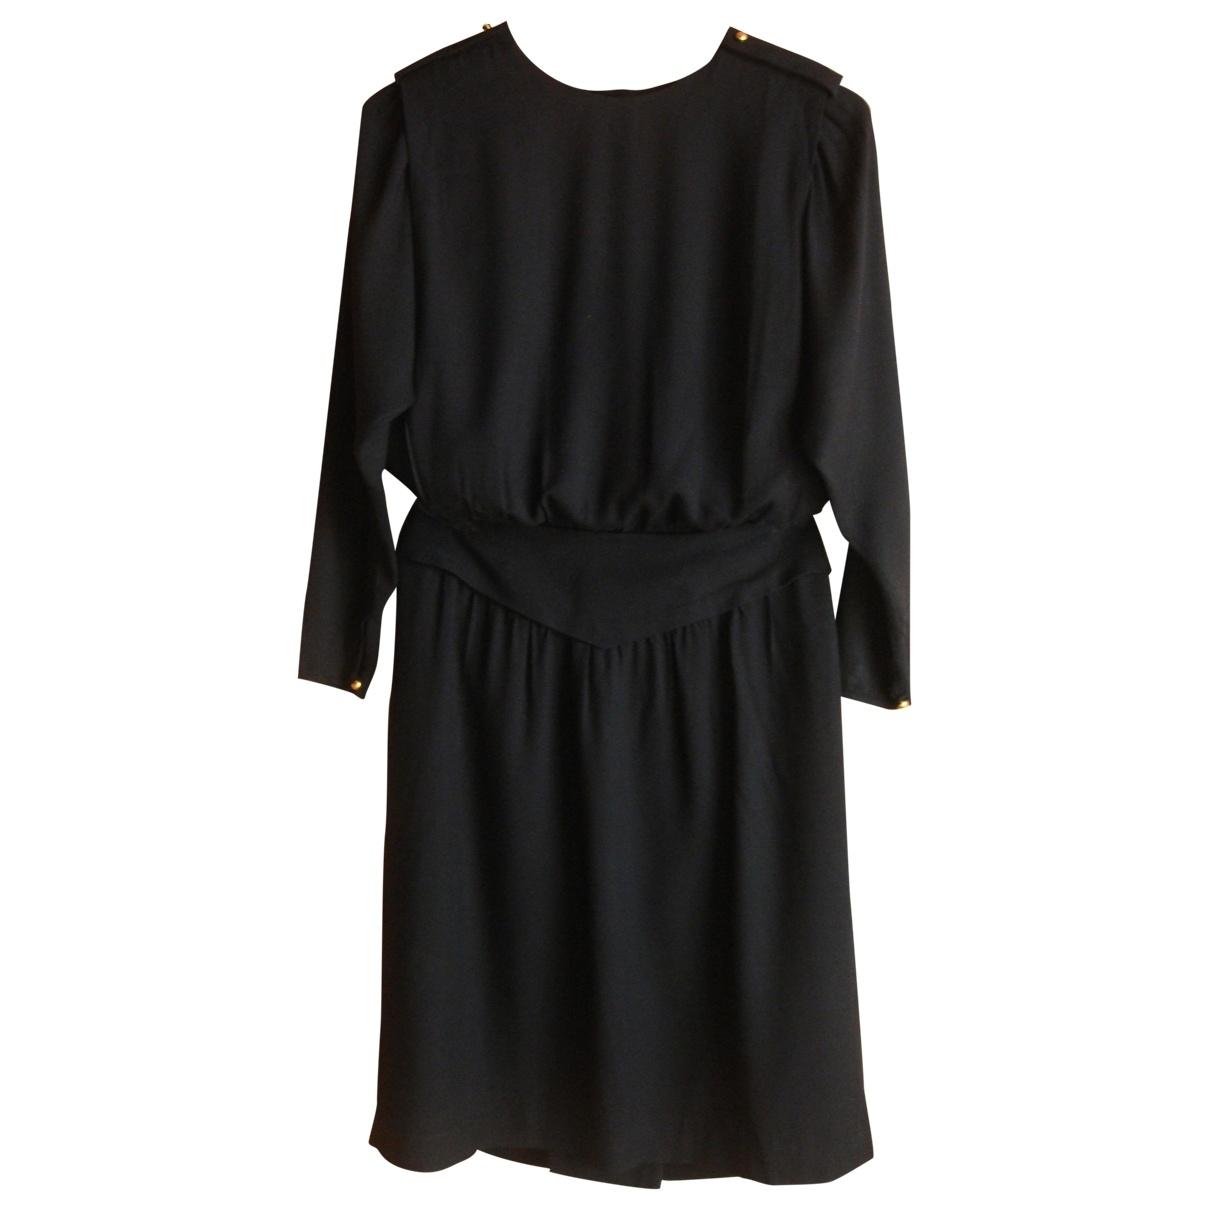 Bimba Y Lola \N Black dress for Women S International